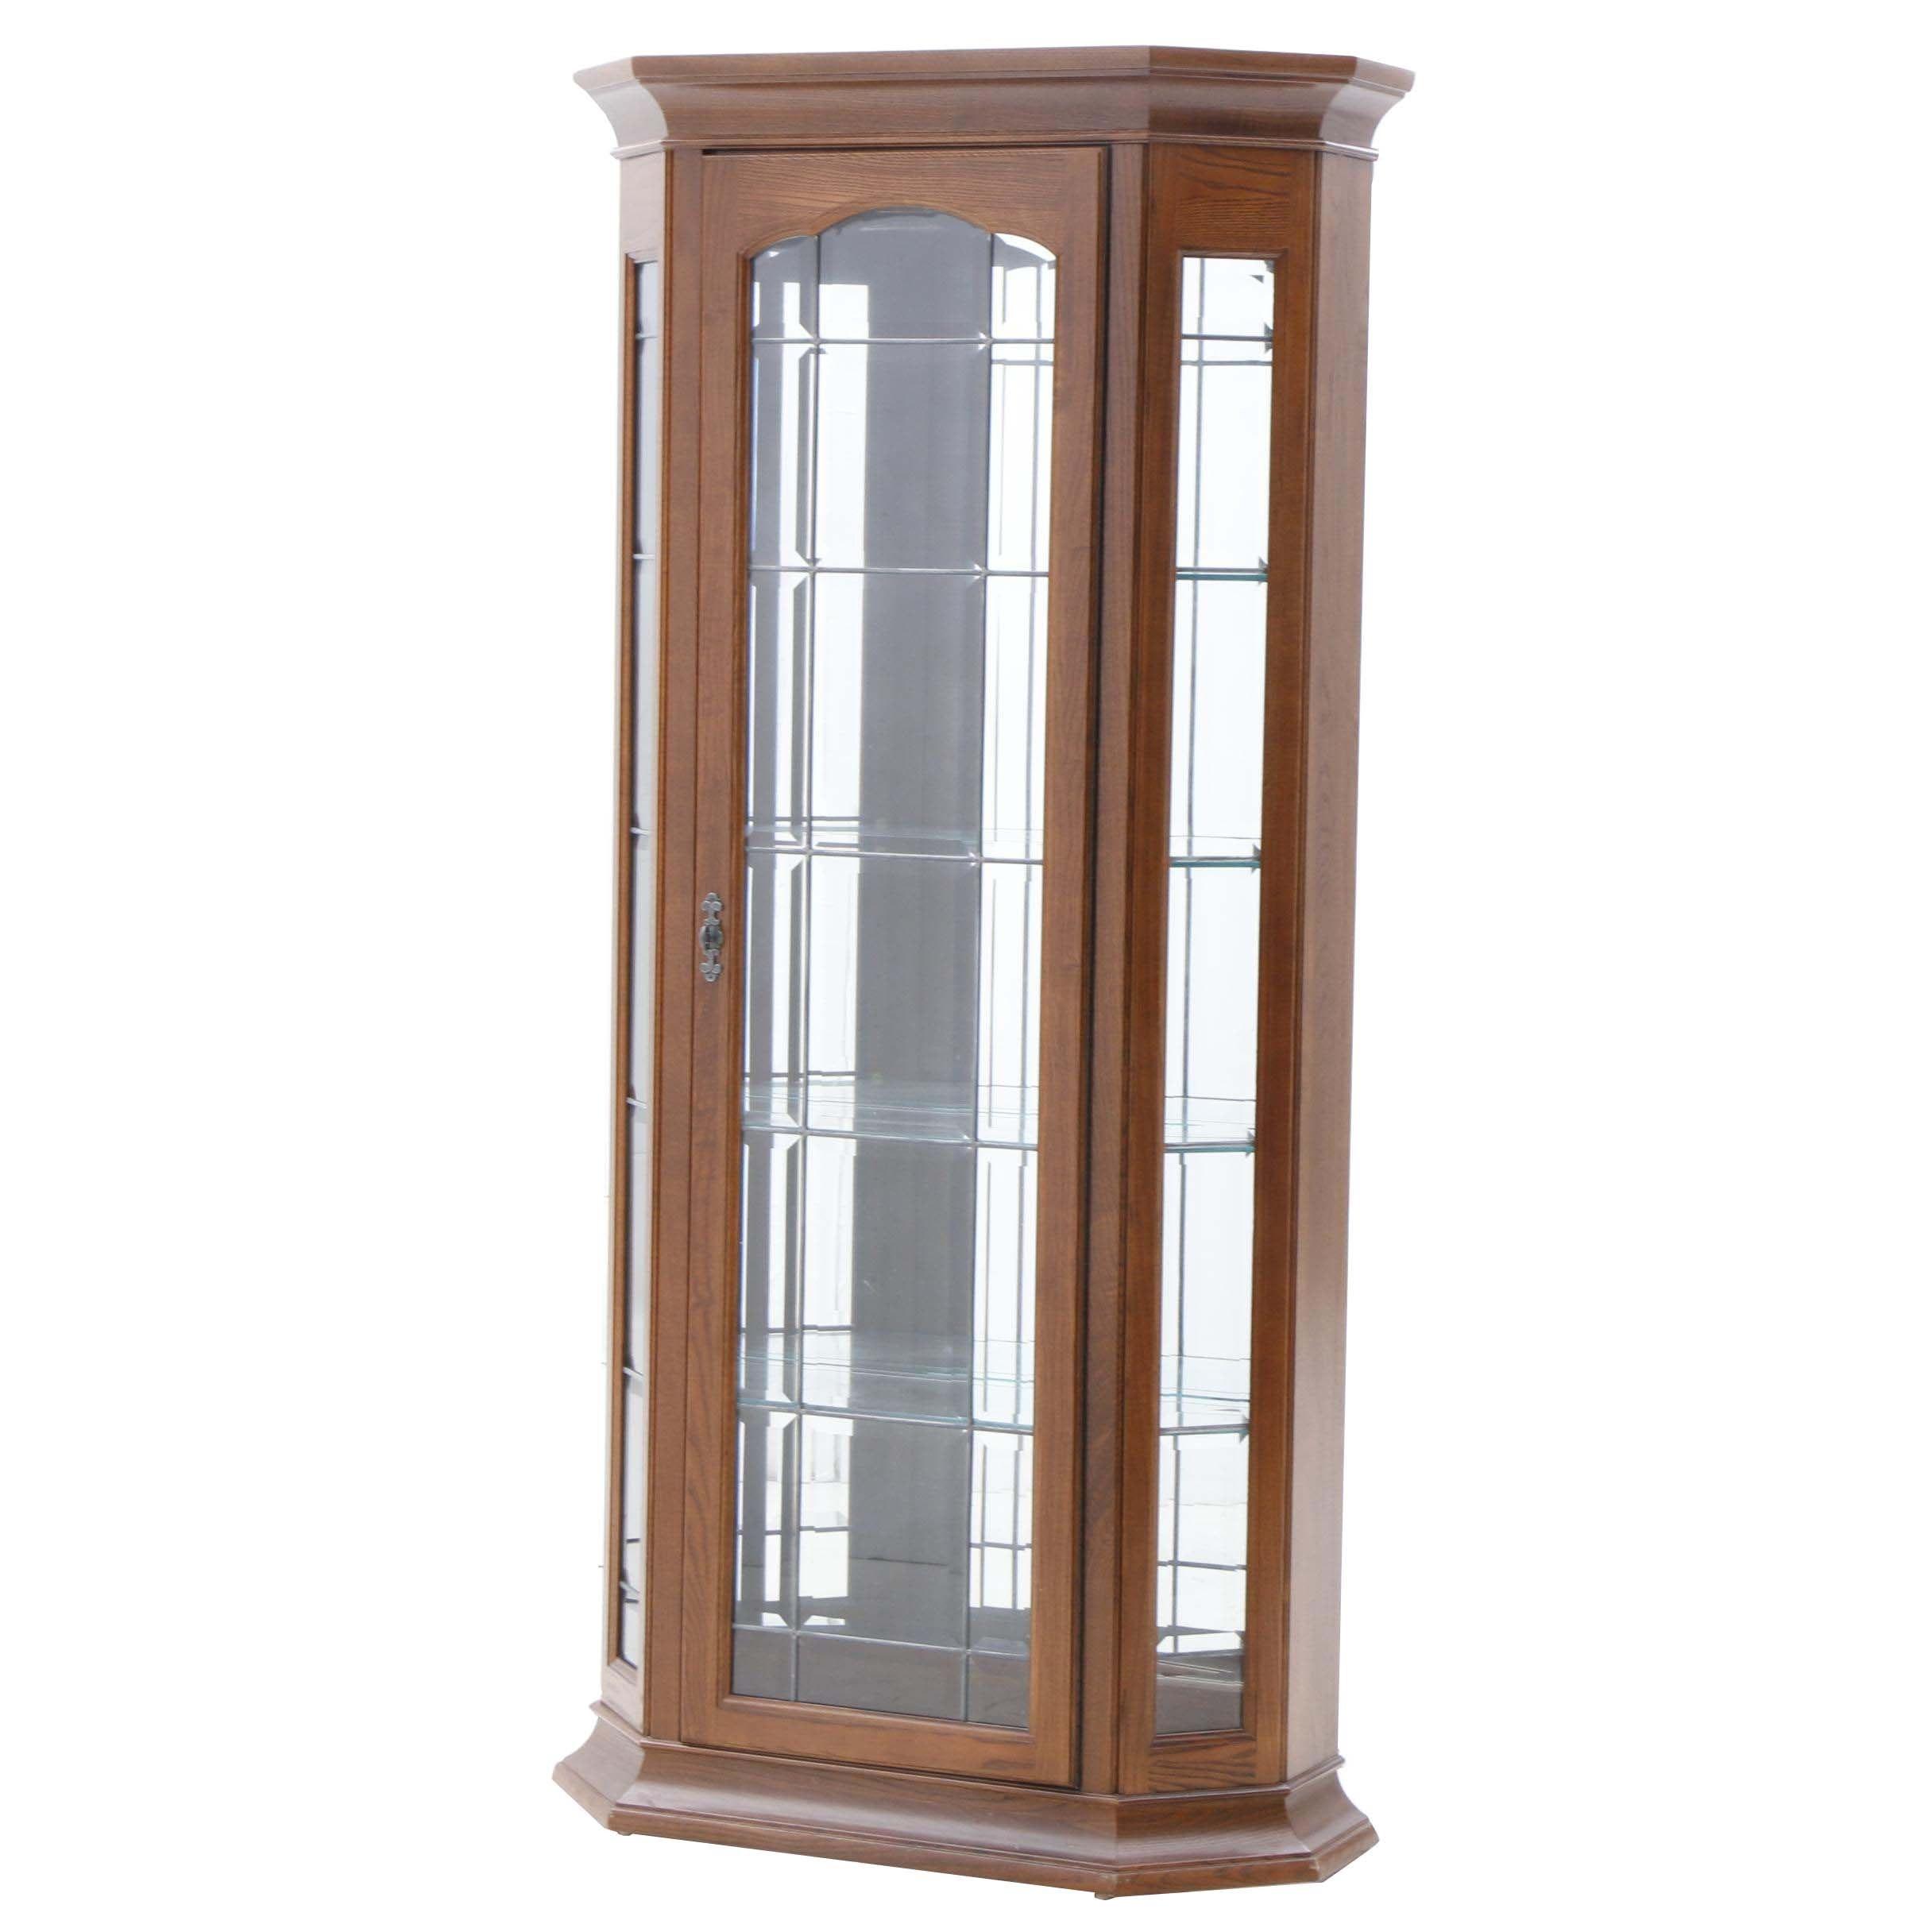 Contemporary Oak Illuminated Display Cabinet by Jasper